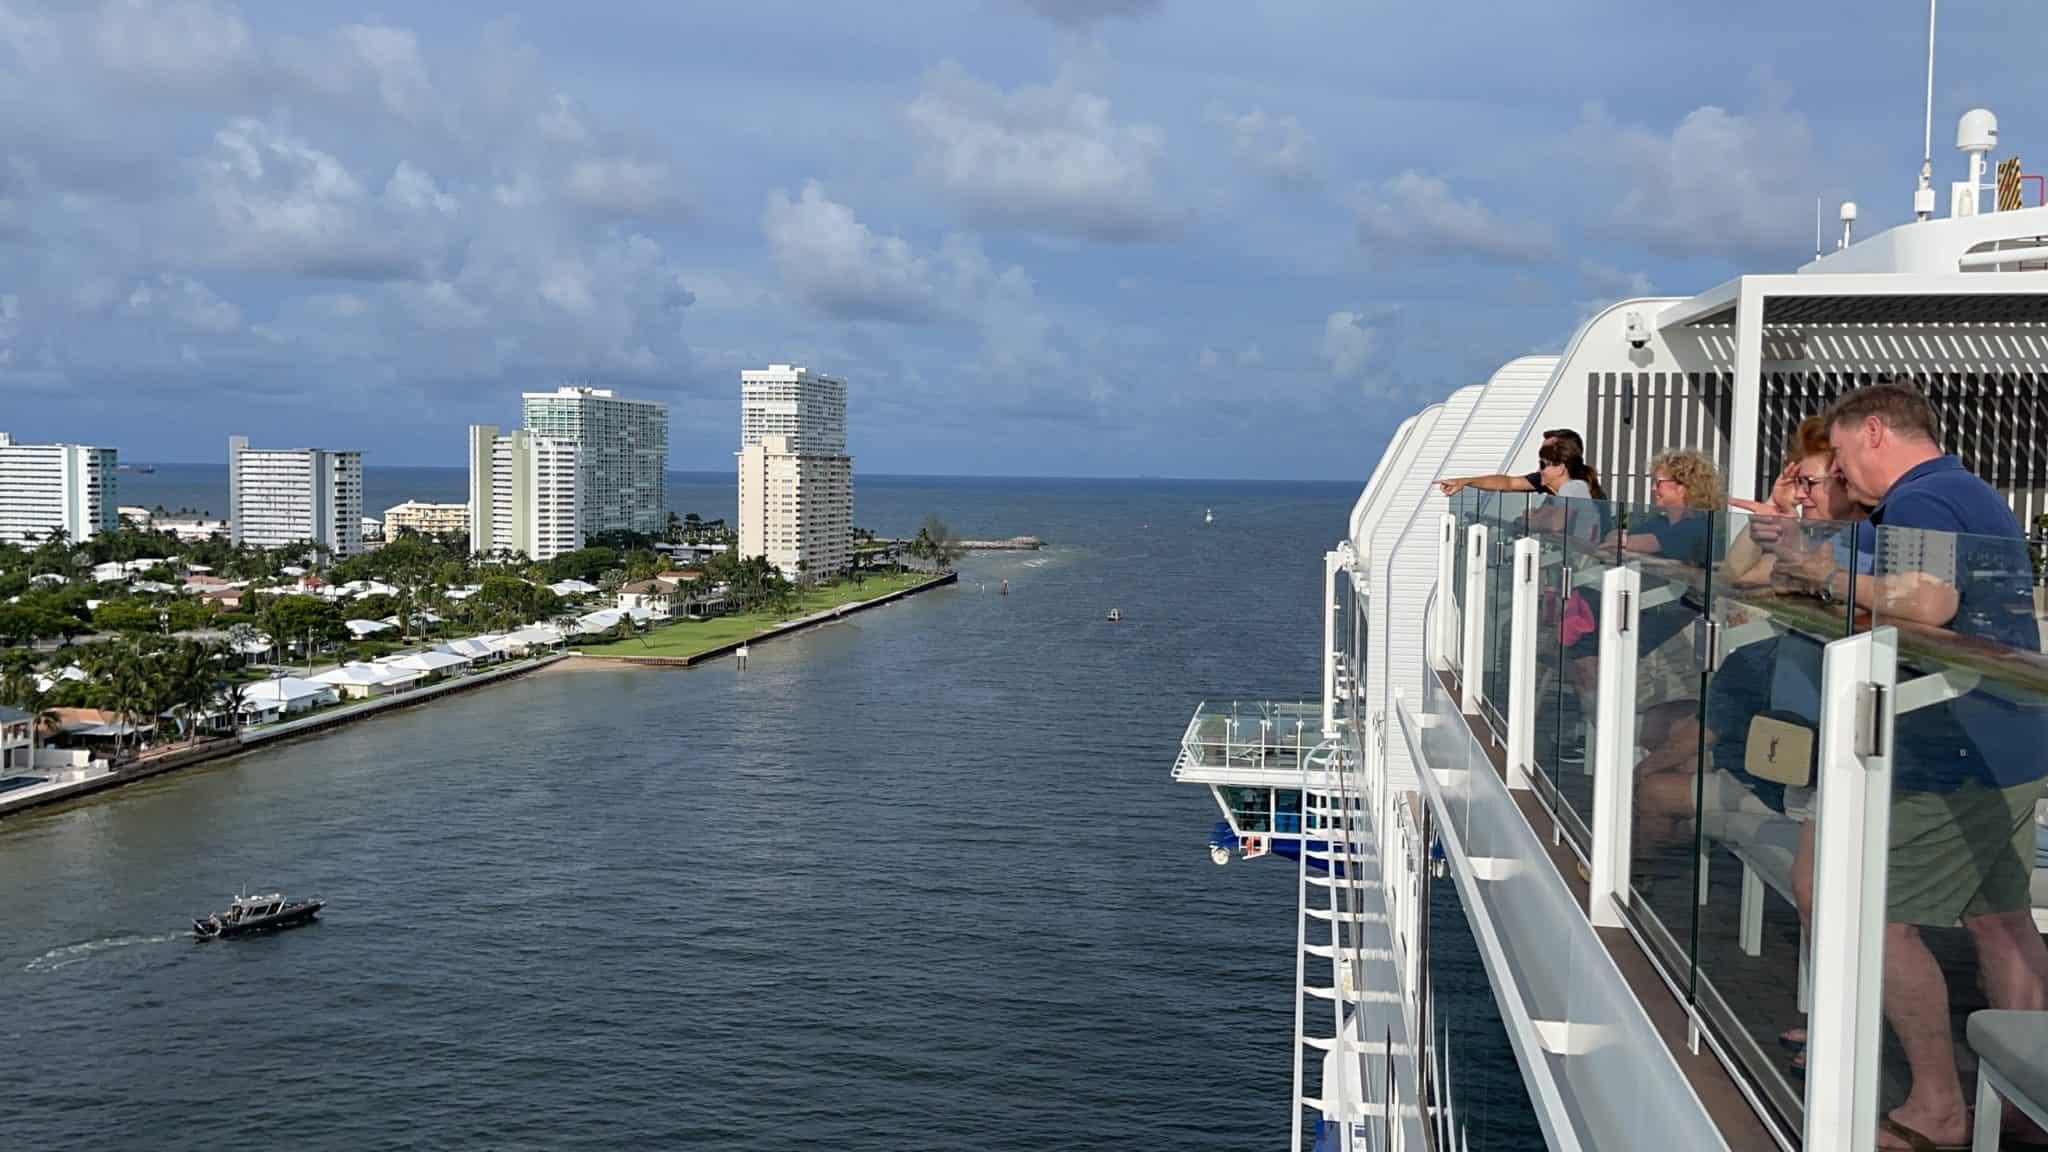 celebrity edge port everglades sail away